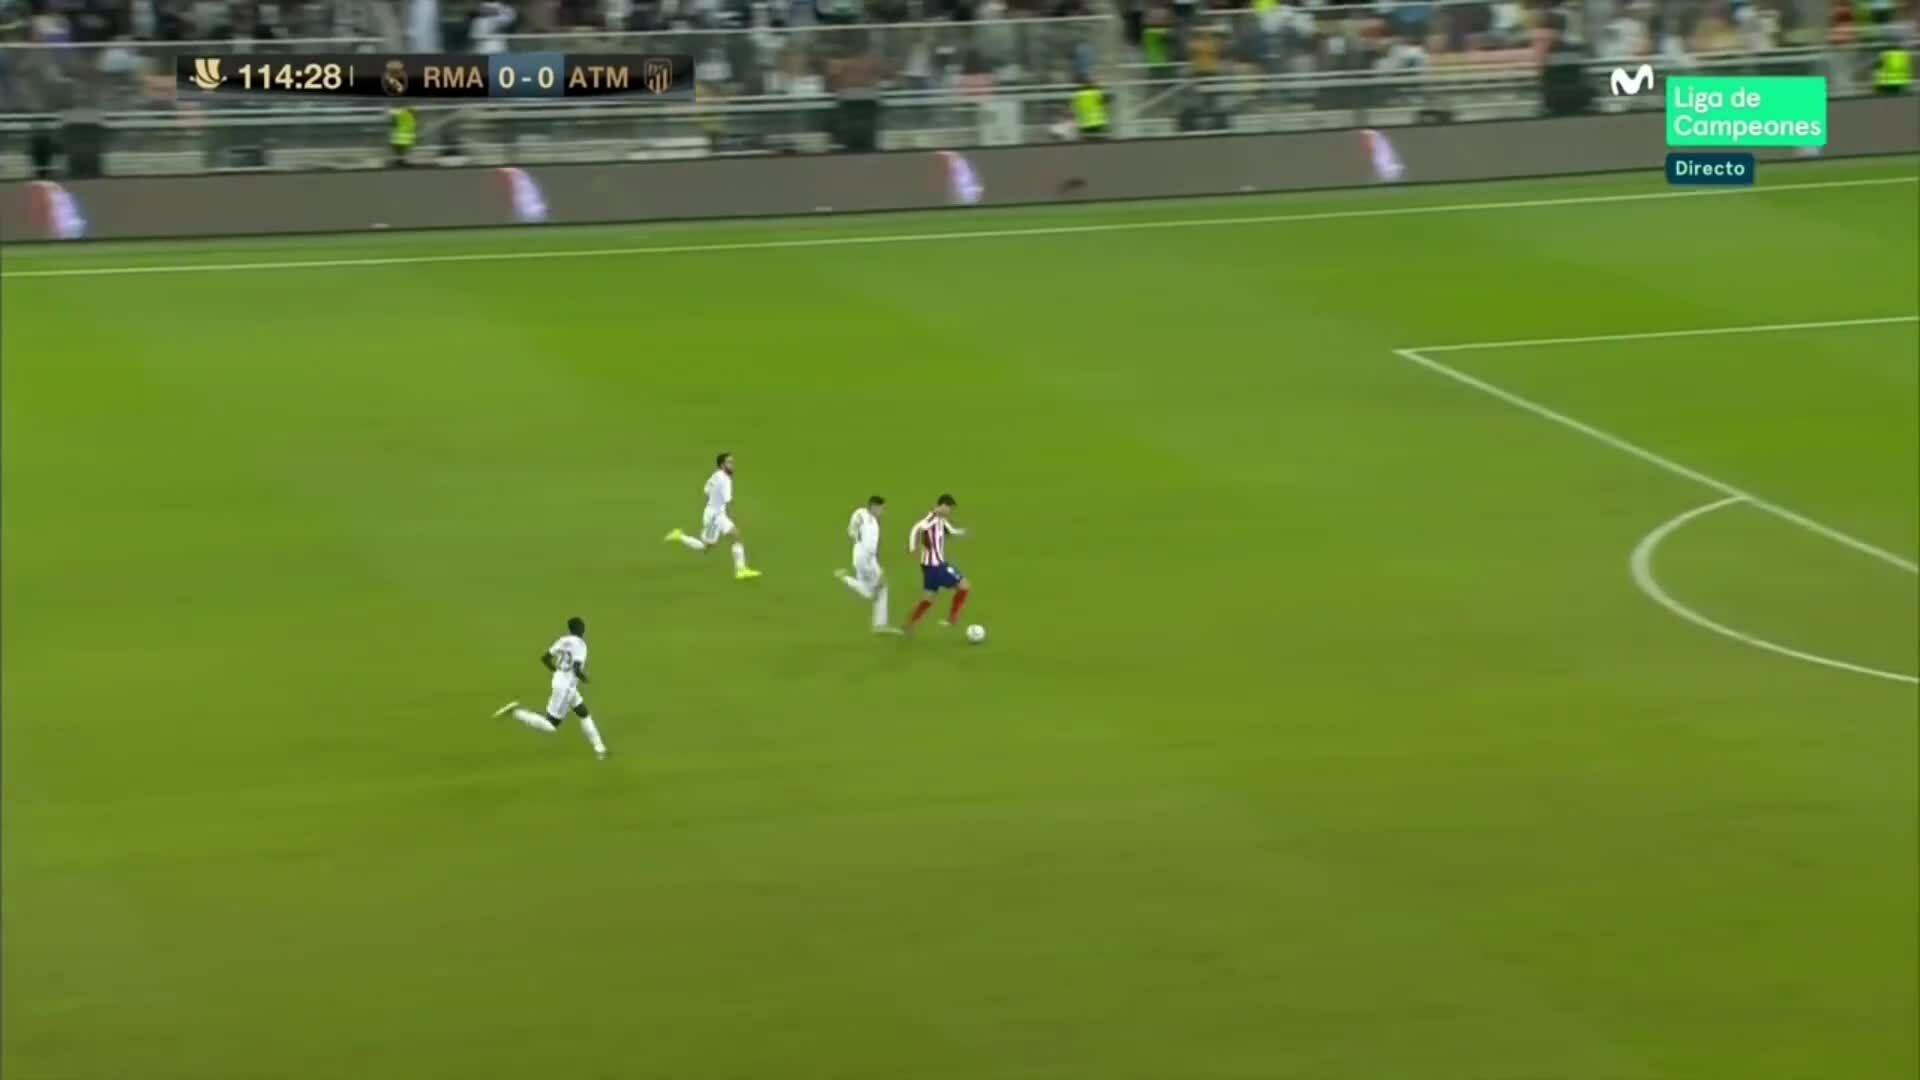 Pha phạm lỗi của Valverde